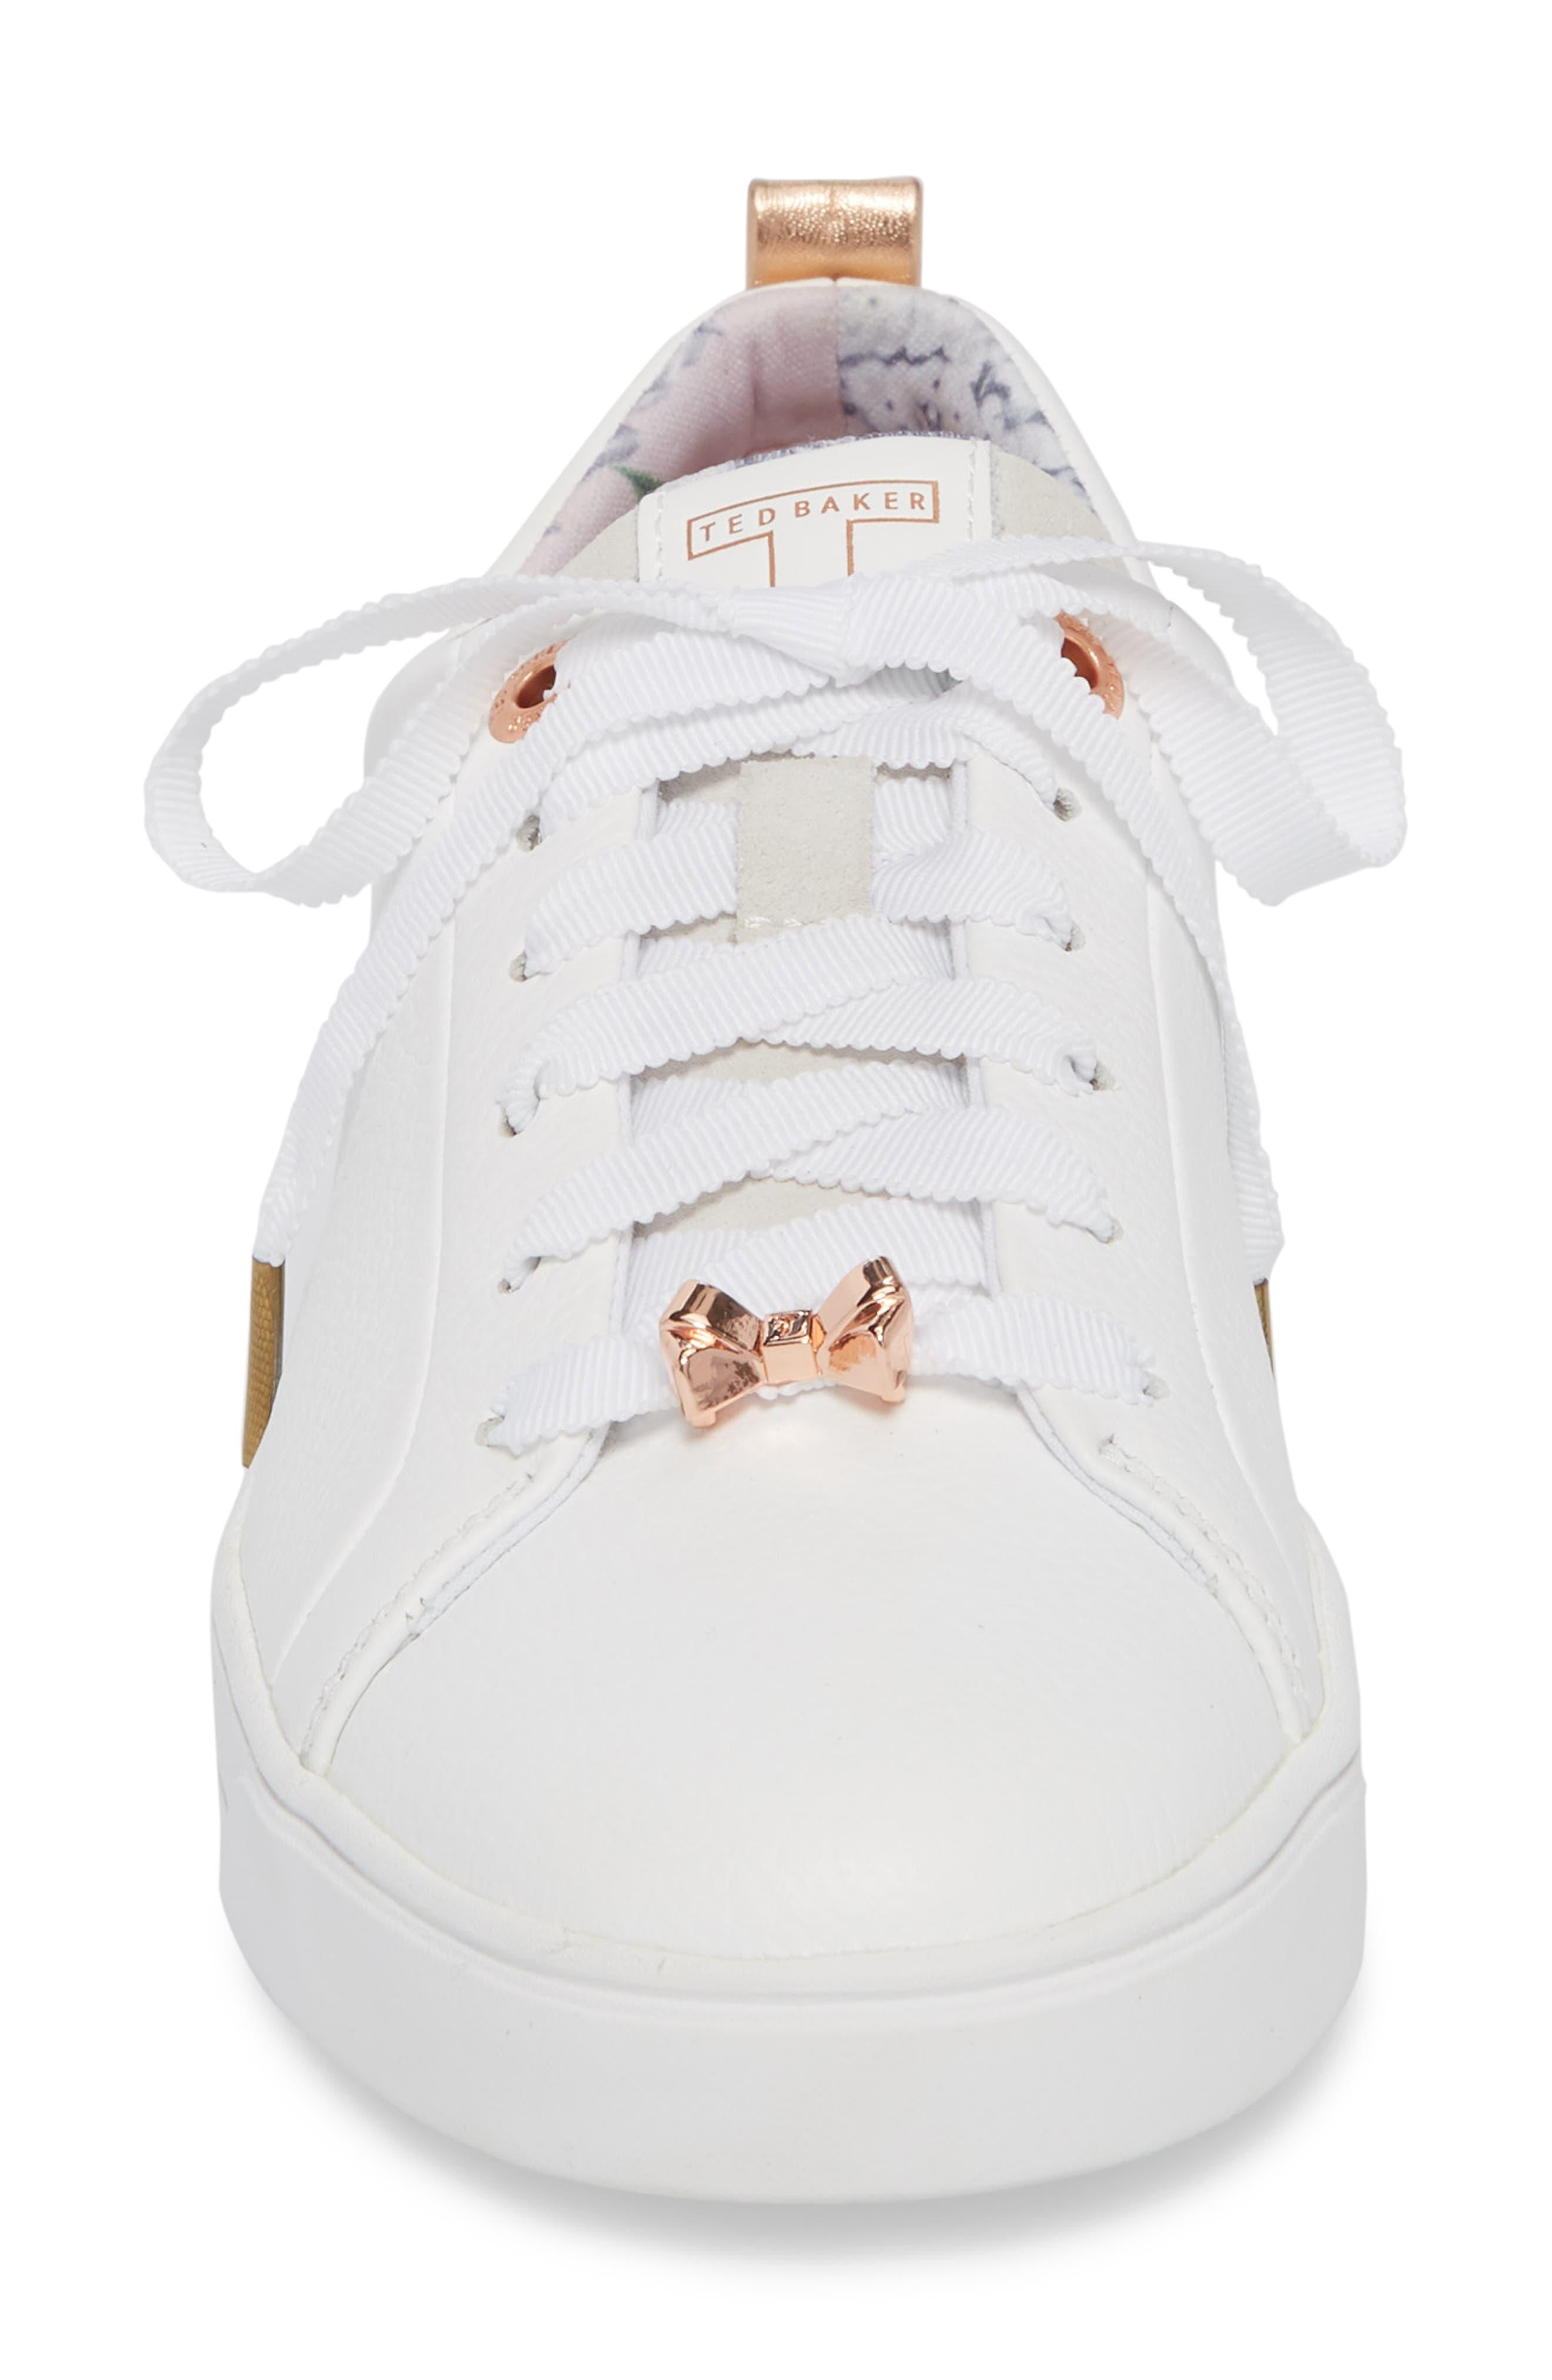 Kelleip Sneaker,                             Alternate thumbnail 4, color,                             PALACE GARDENS PRINT LEATHER